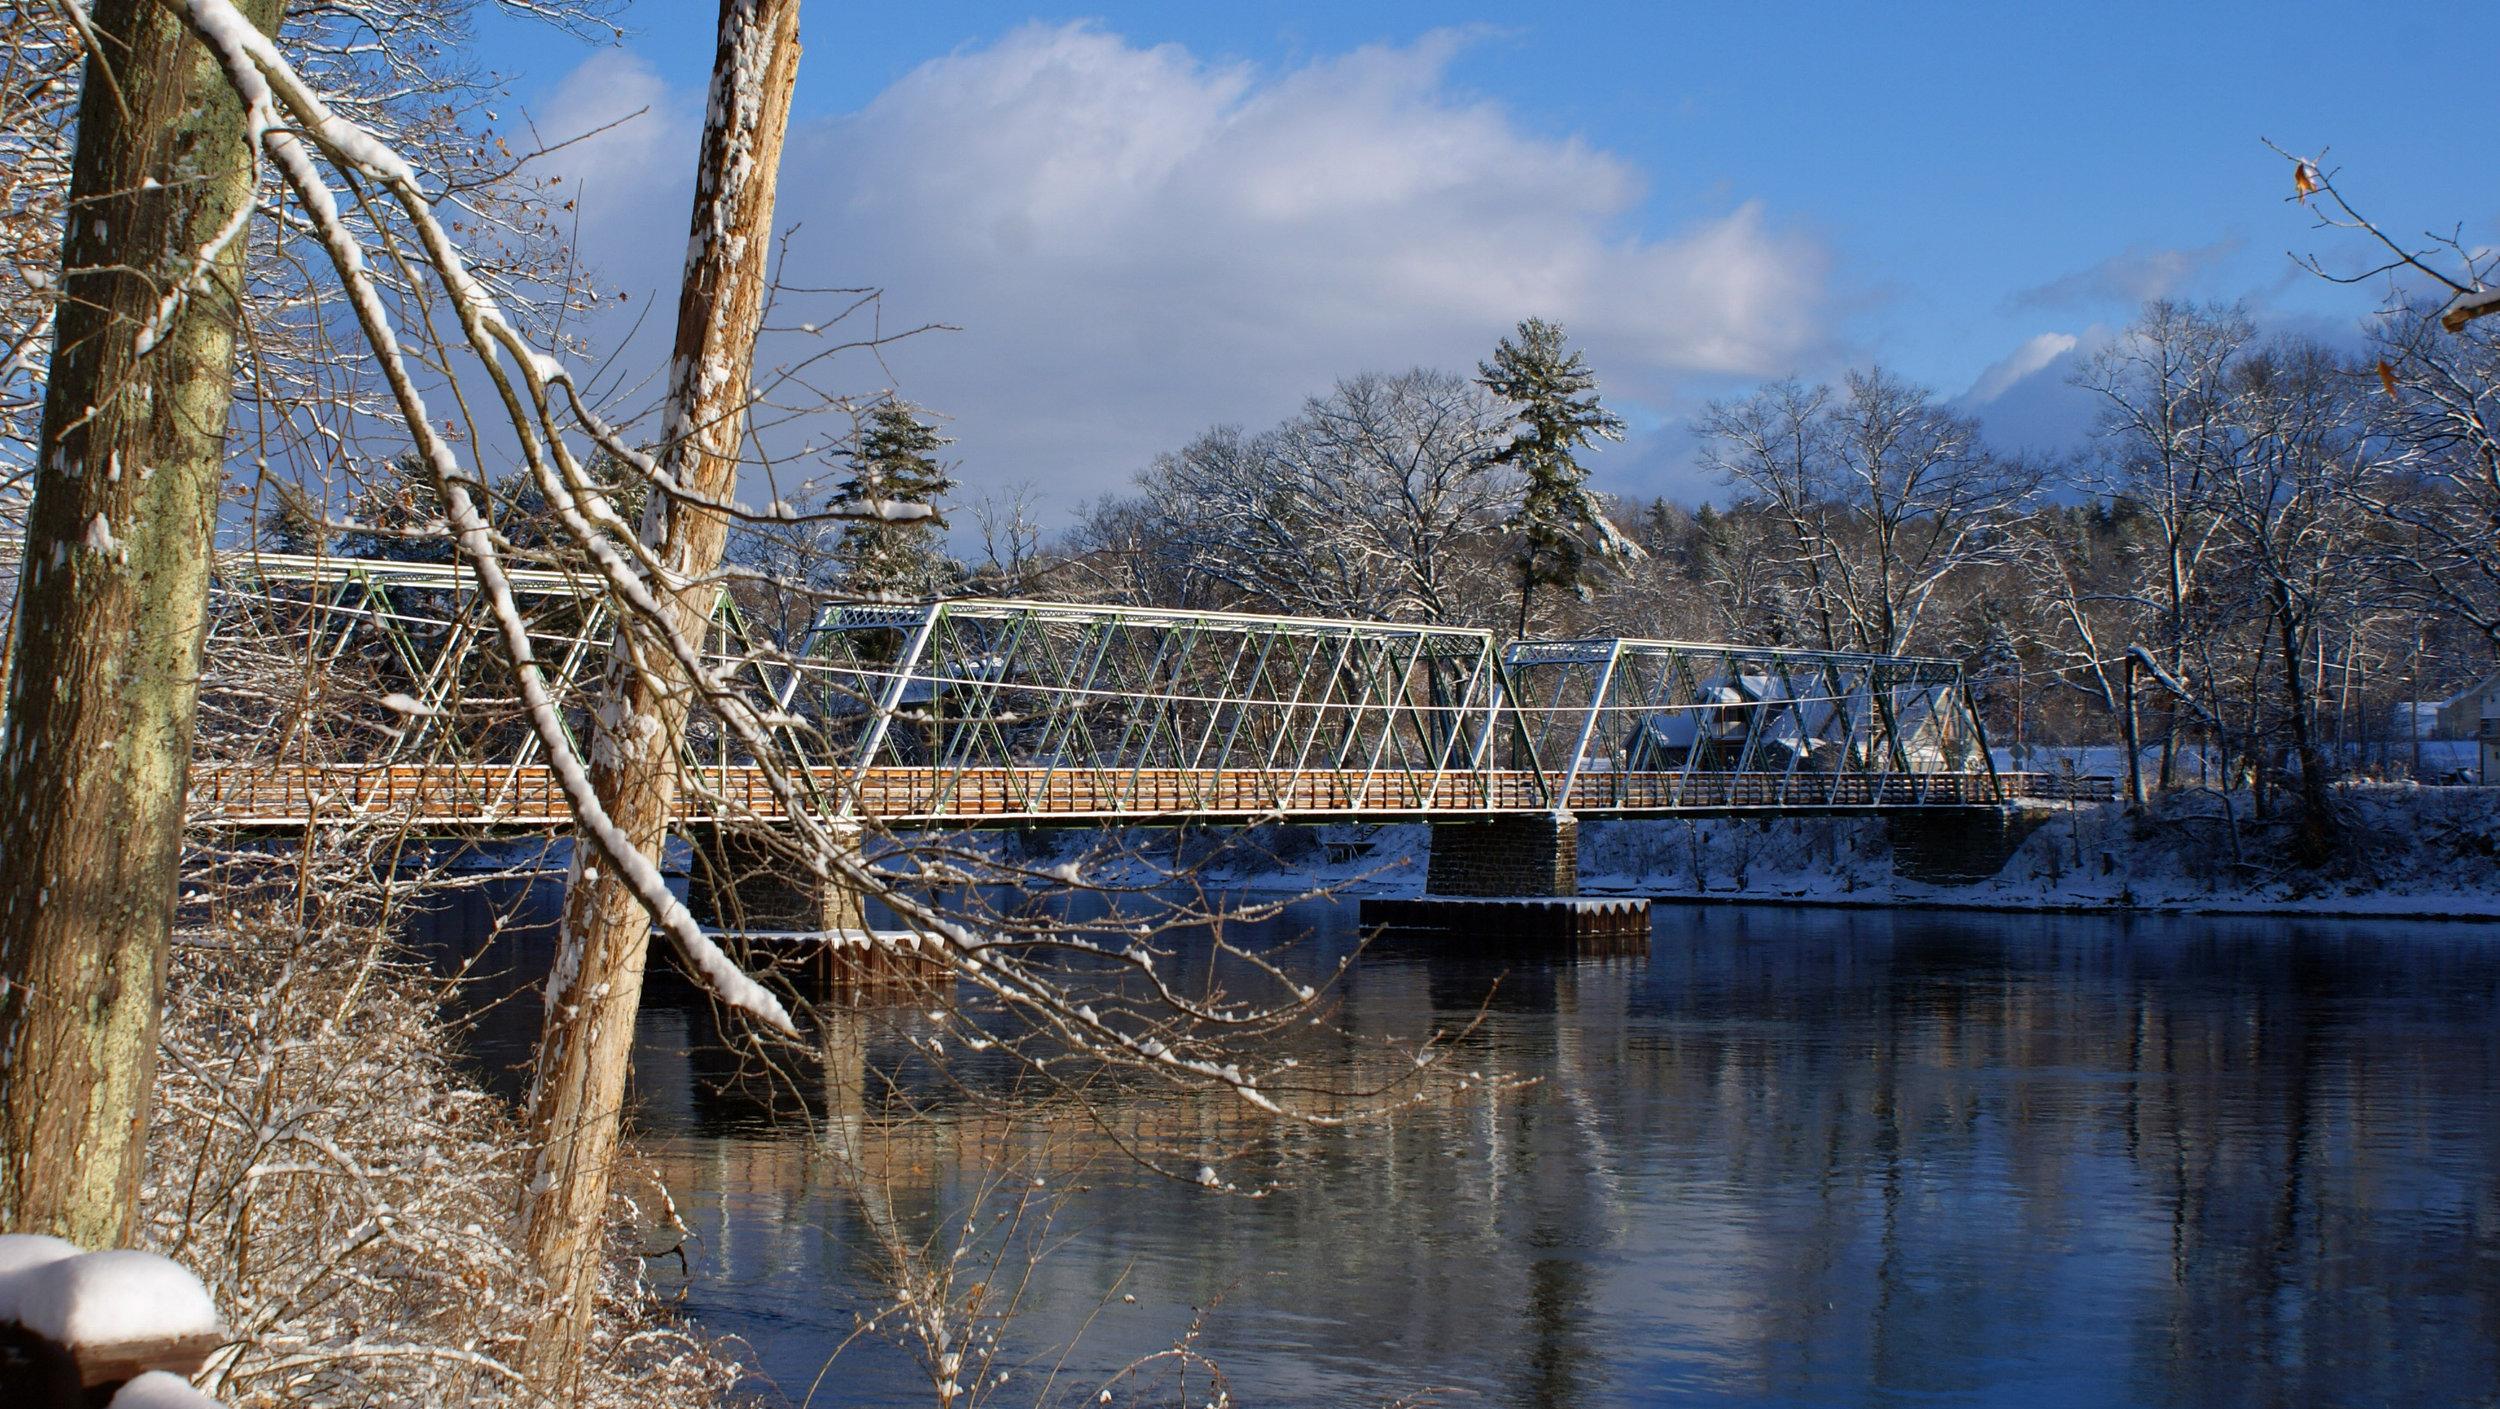 The Dix Bridge -